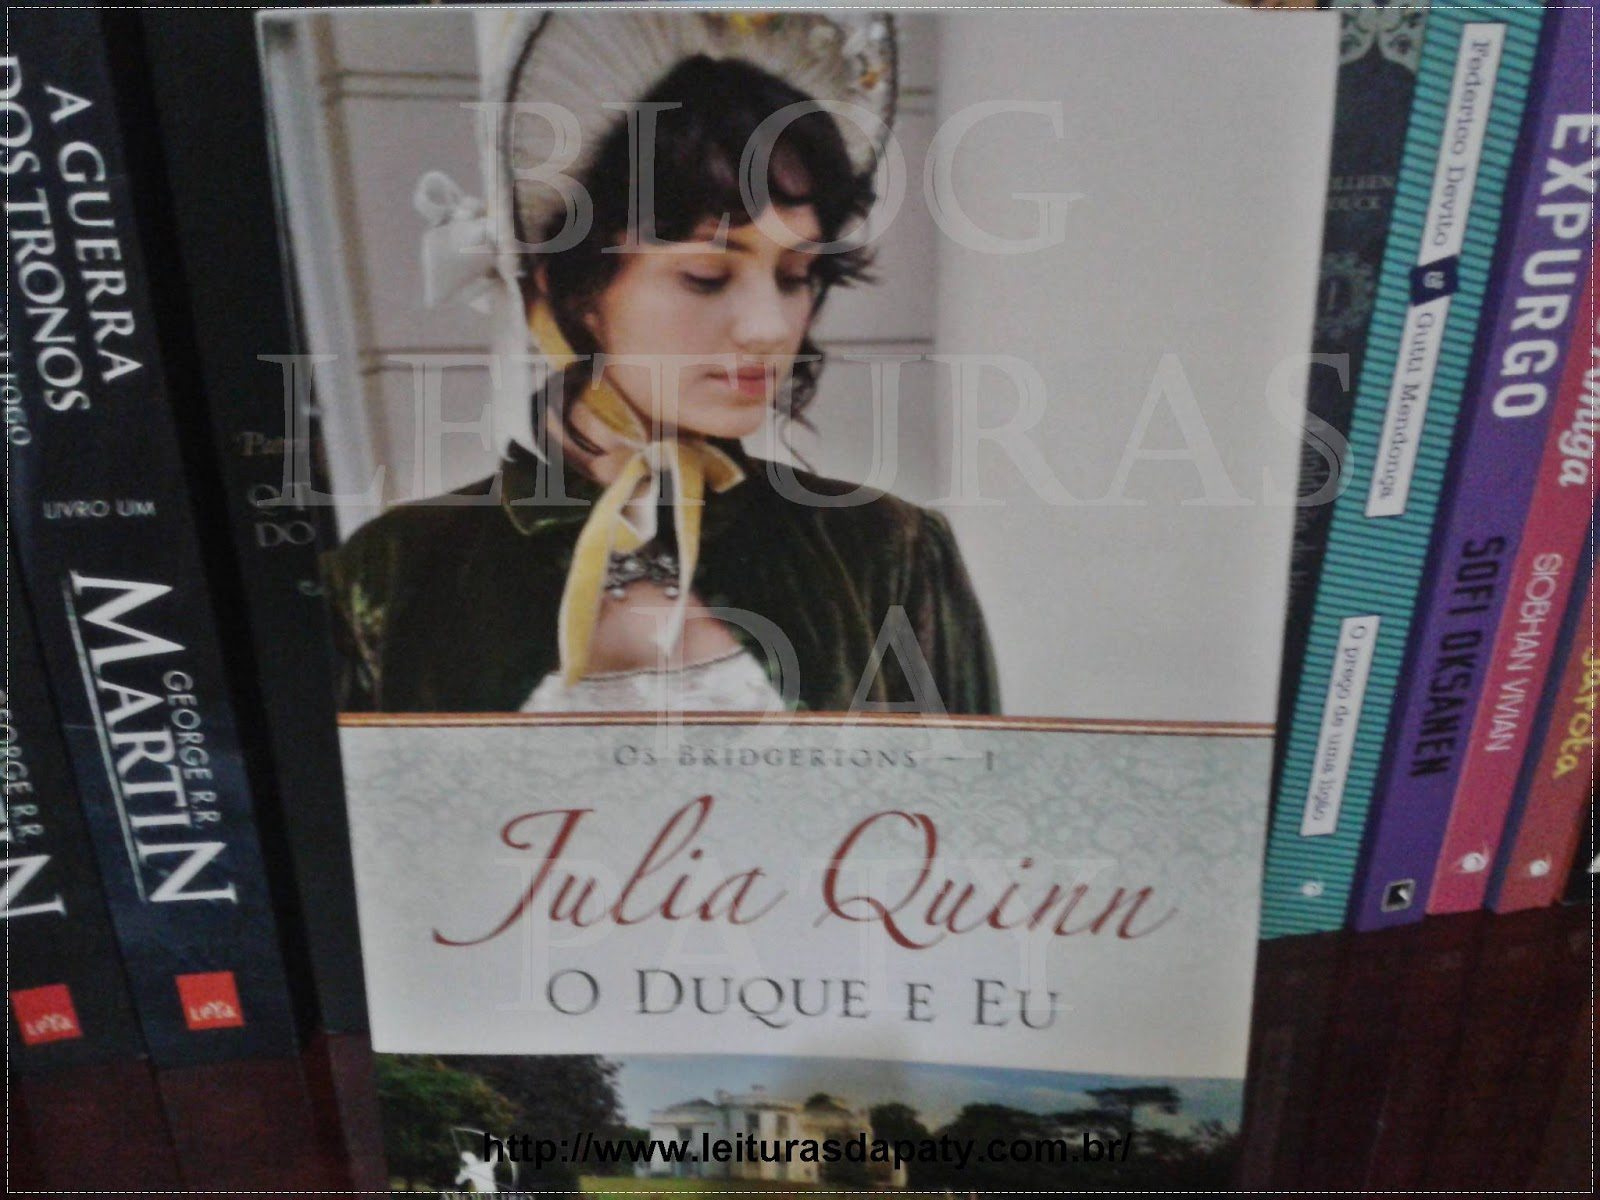 O Duque e Eu - Julia Quinn - Blog Leituras da Paty